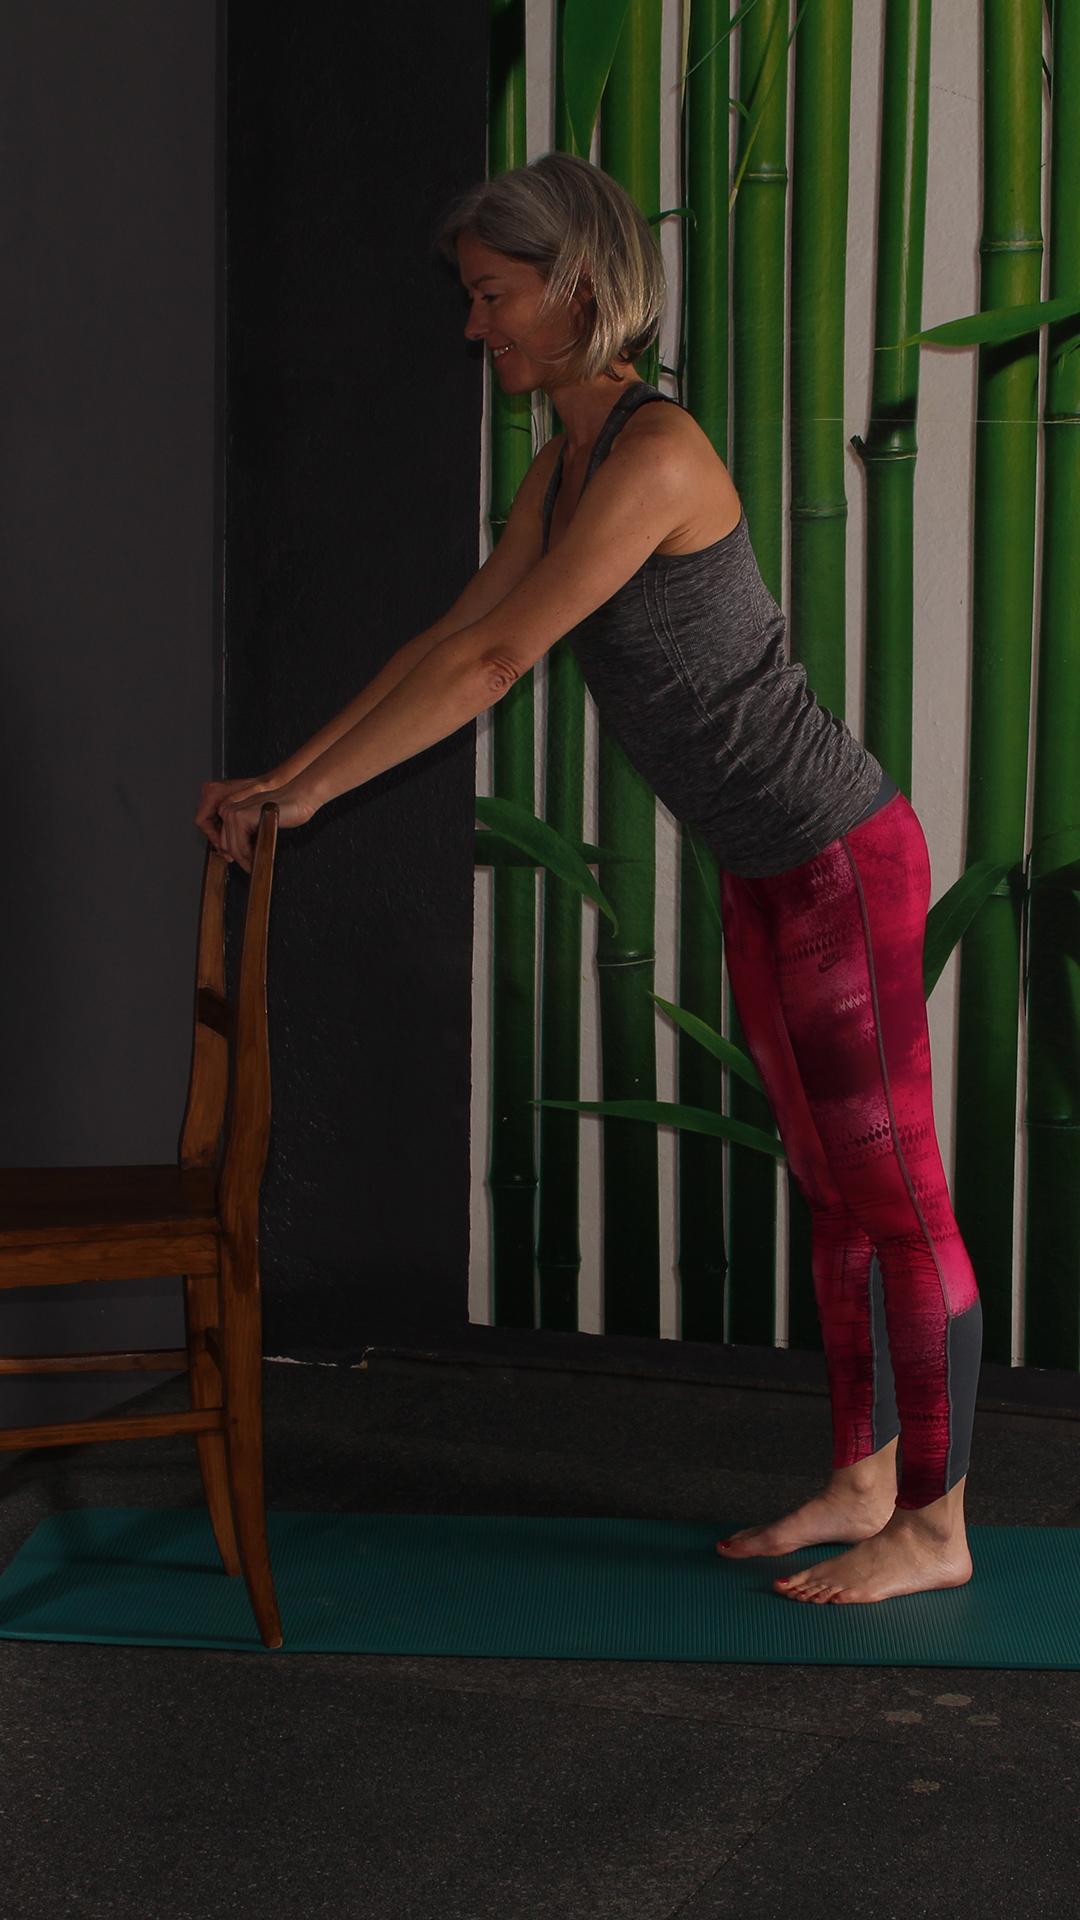 Grundposition Dehnung langer Rücken. Frau hat Hände am Stuhl, steht 2 Schritte hinterm Stuhl, Oberkörper aufrecht. Übung gegen Rückenschmerzen